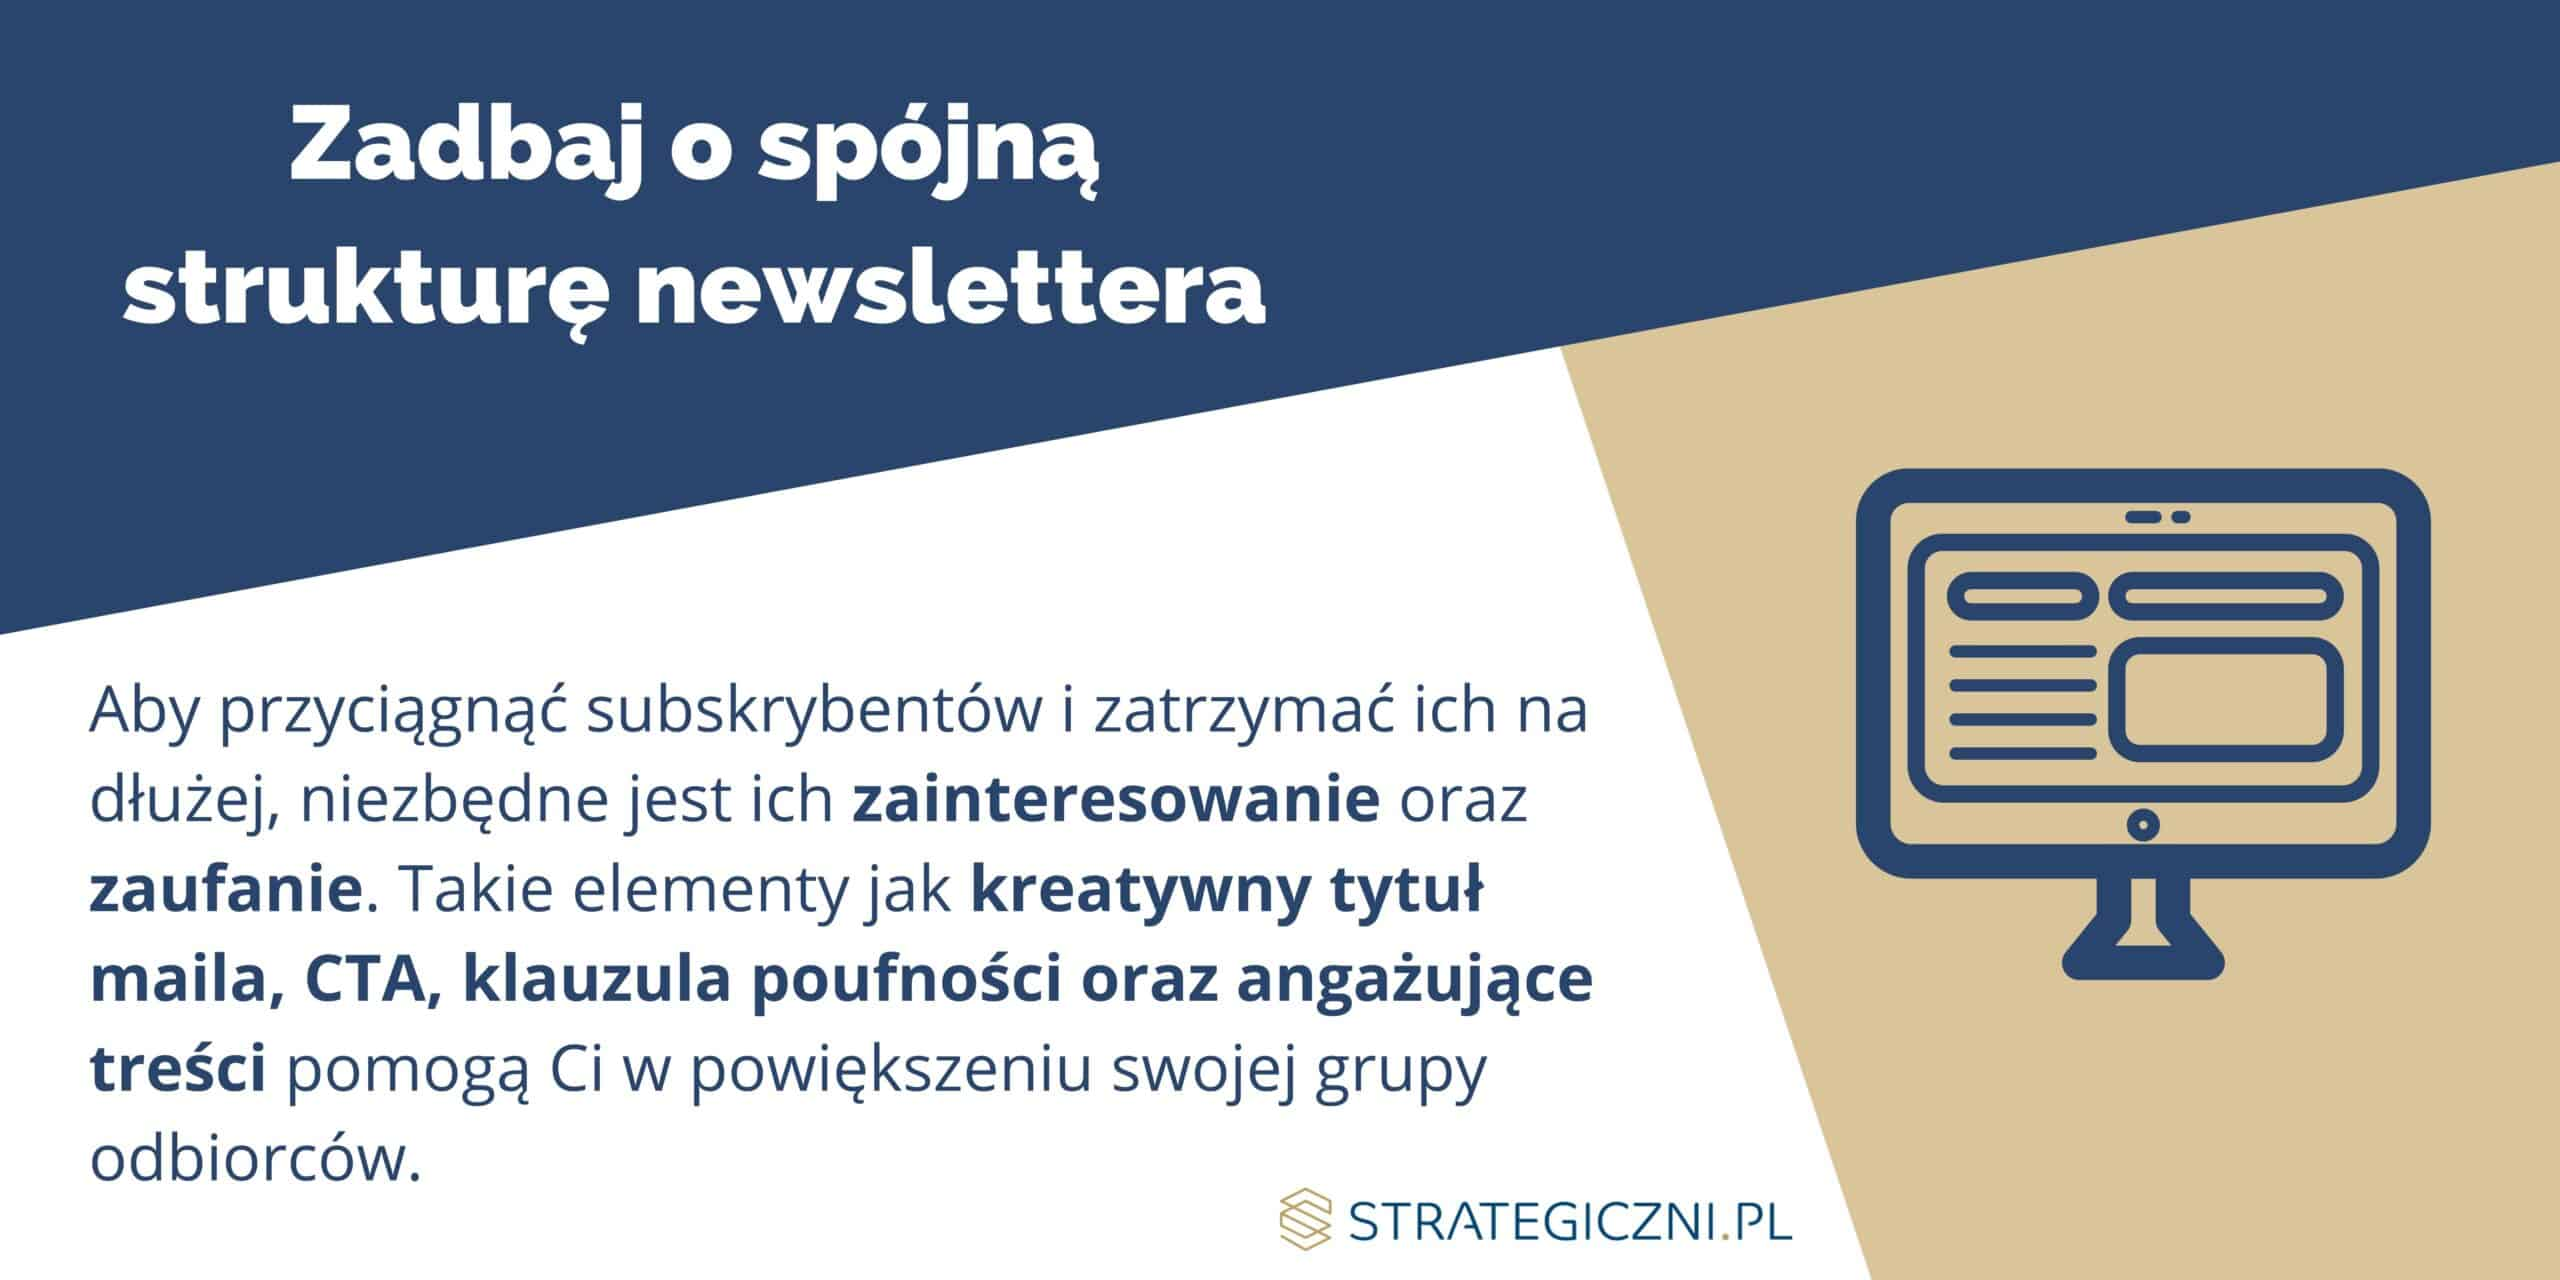 Zadbaj-o-spojna-strukture-newslettera